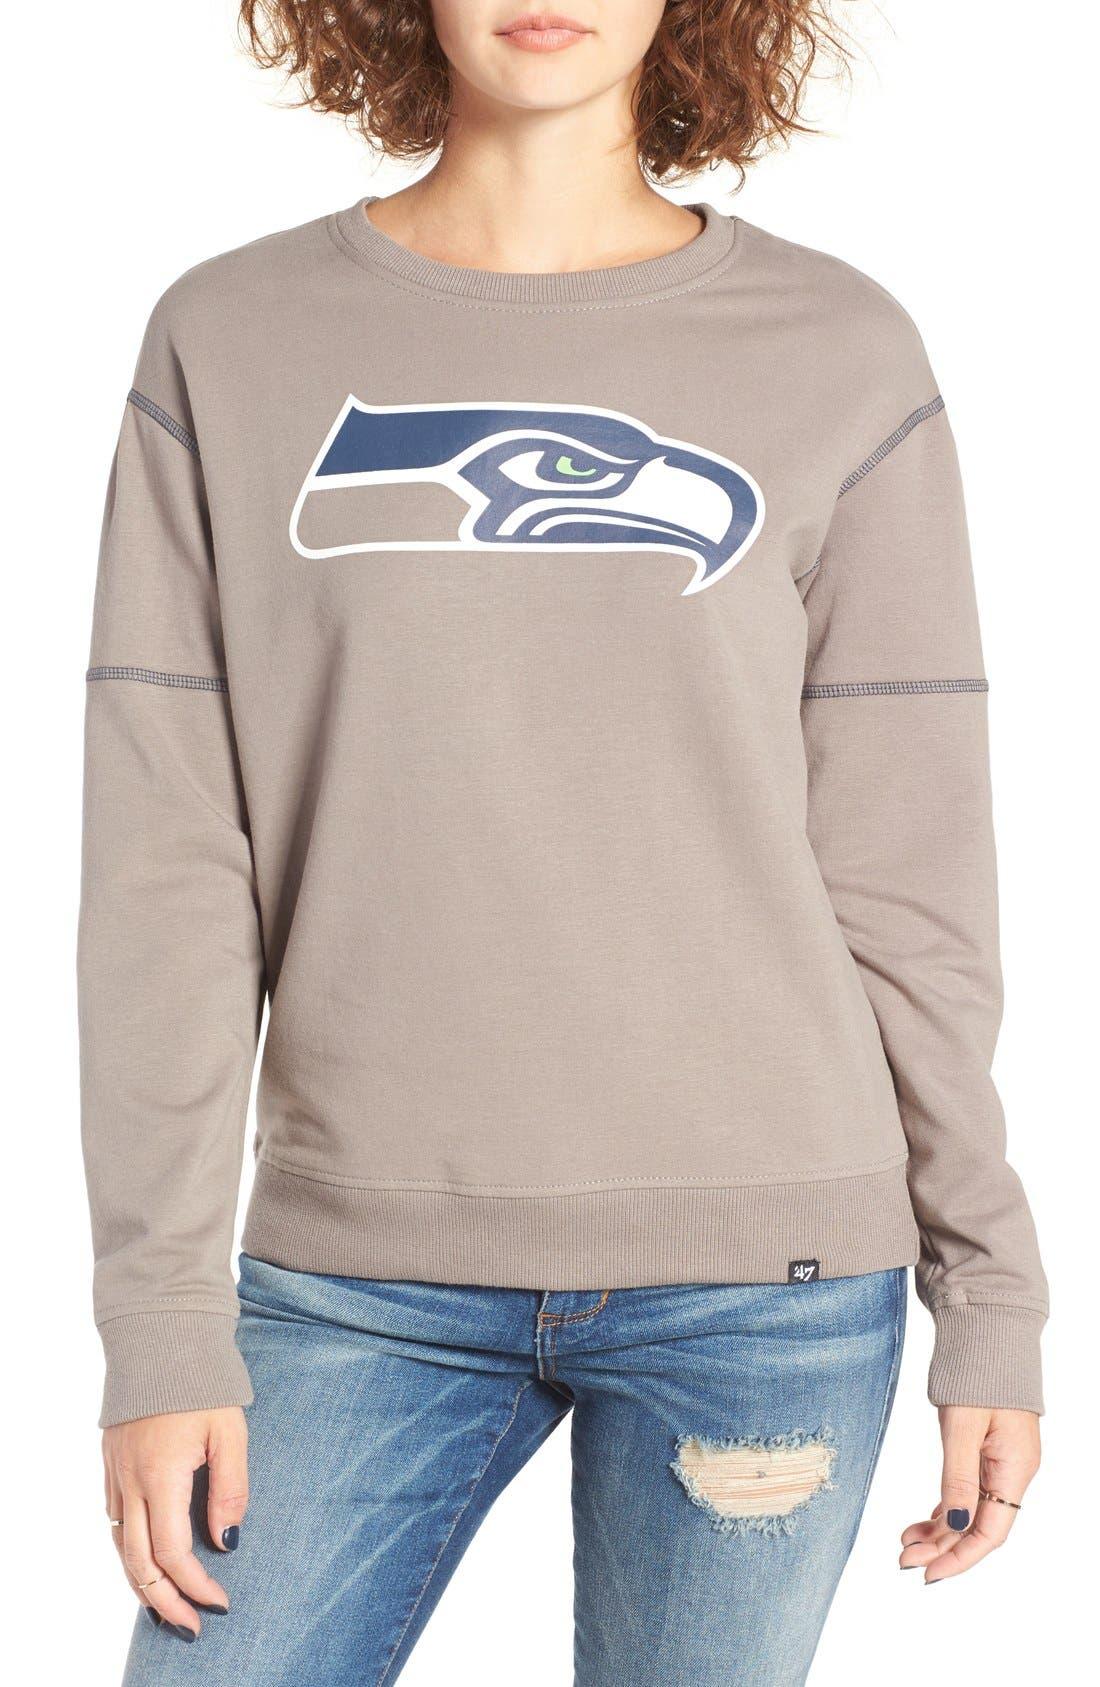 Main Image - 47 Brand 'Seattle Seahawks' Graphic Sweatshirt